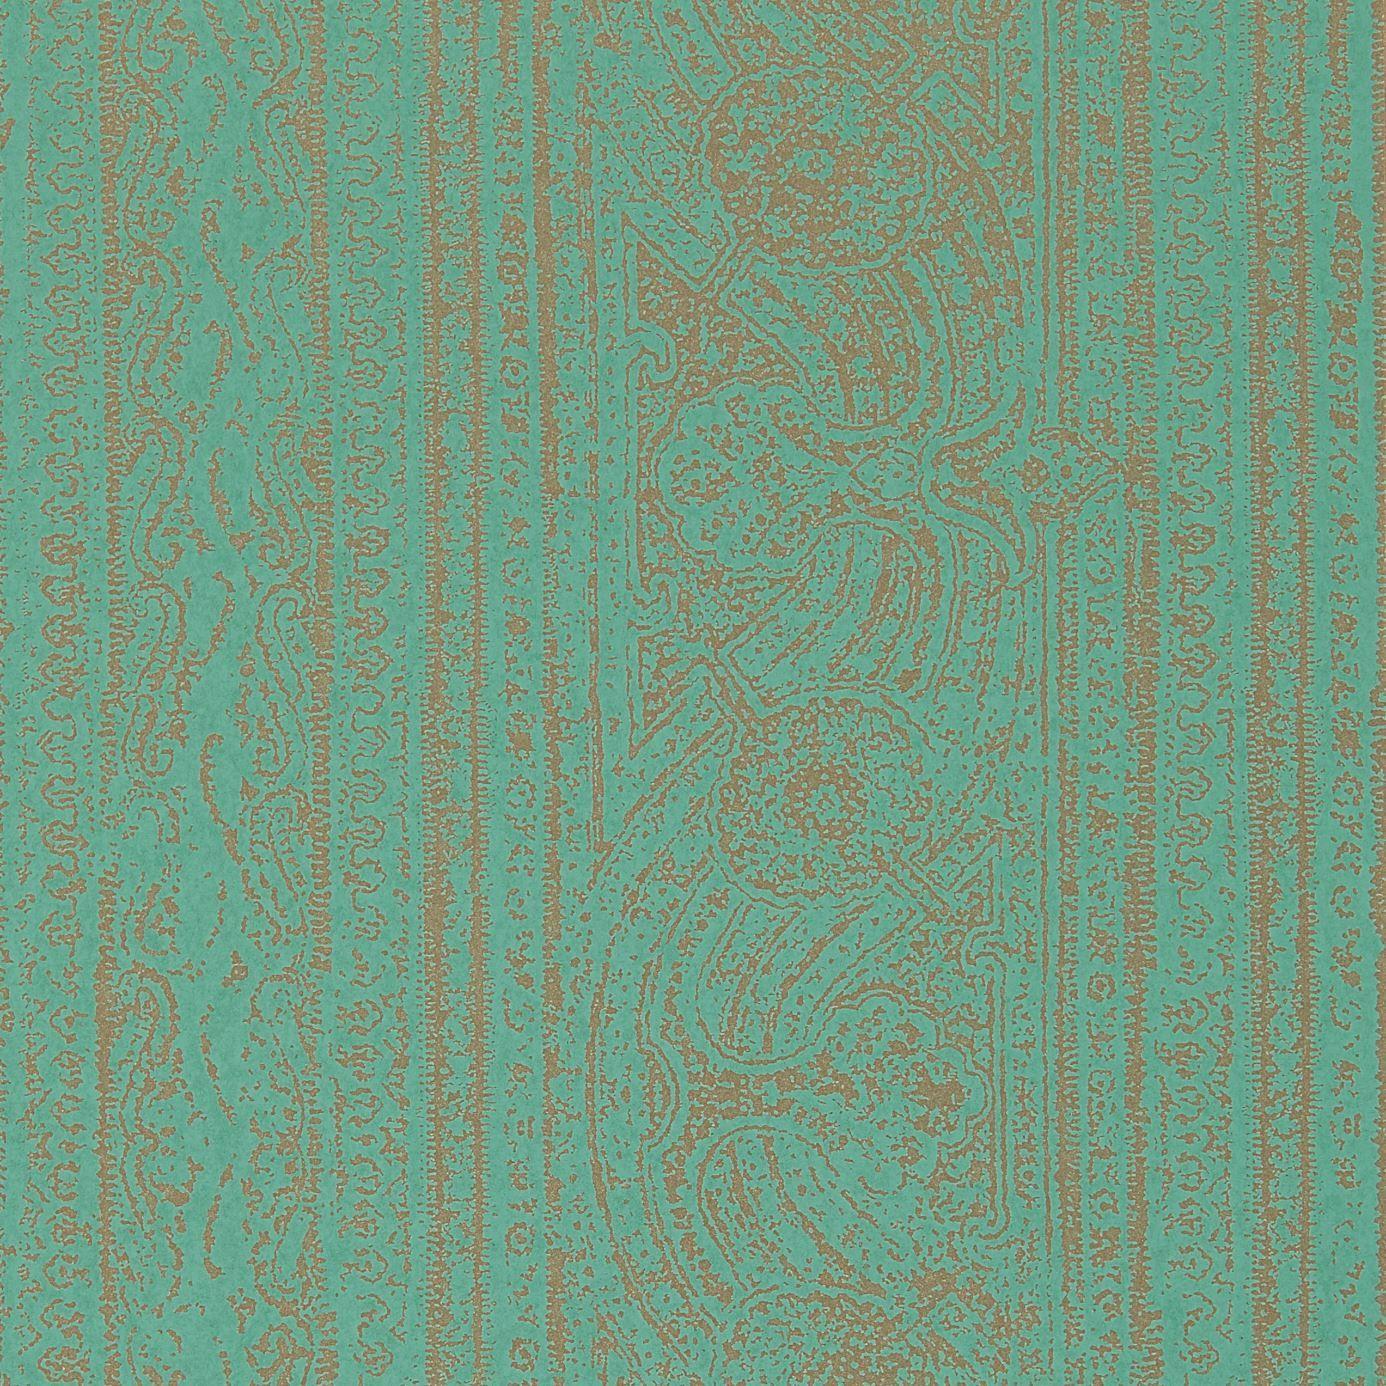 Odisha Wallpaper Gold wallpaper, Striped wallpaper